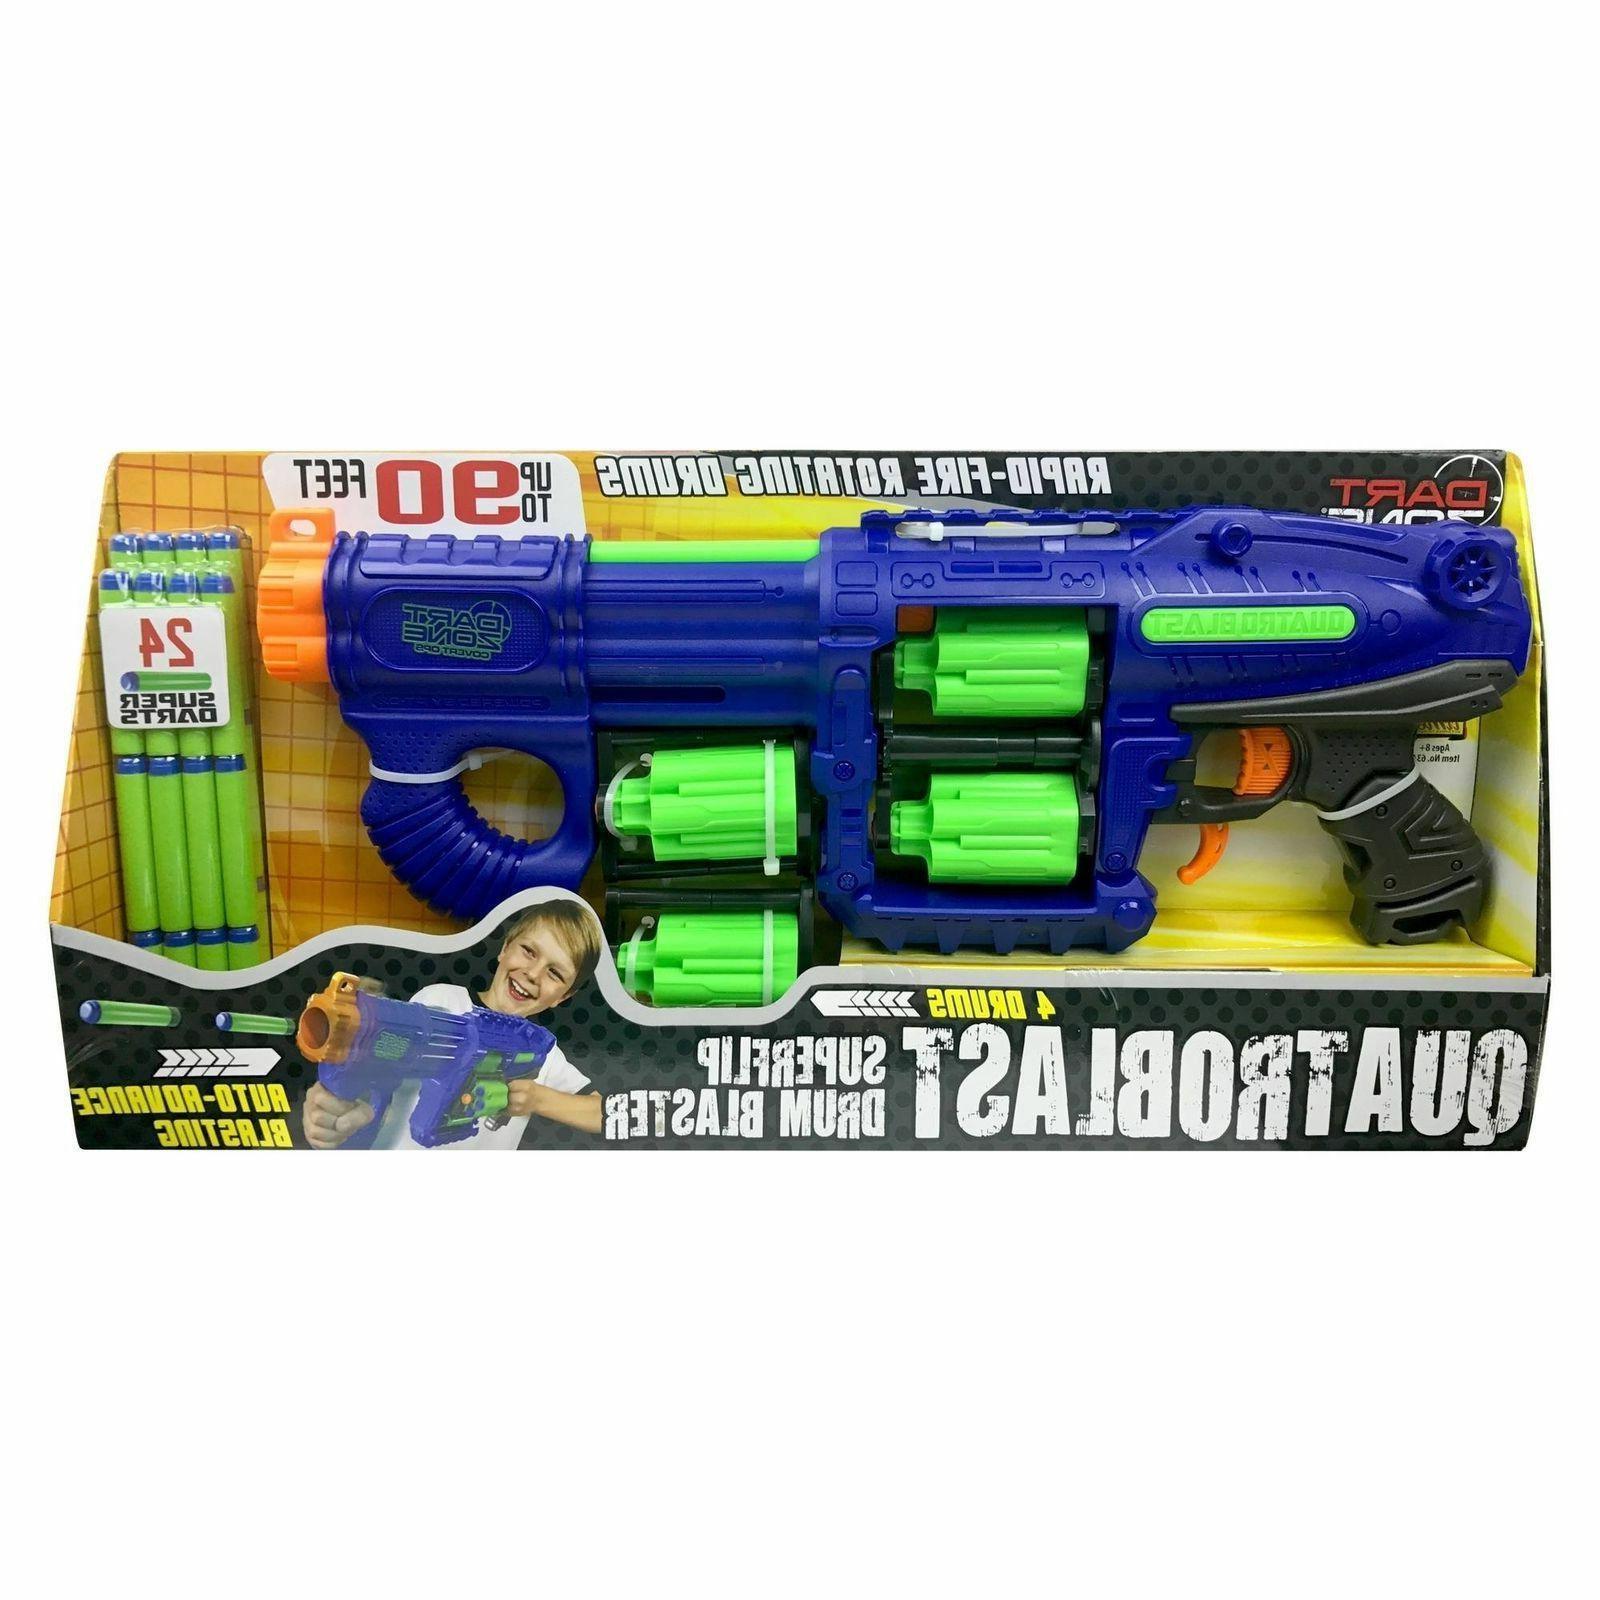 Dart Zone Blaster or Blaster